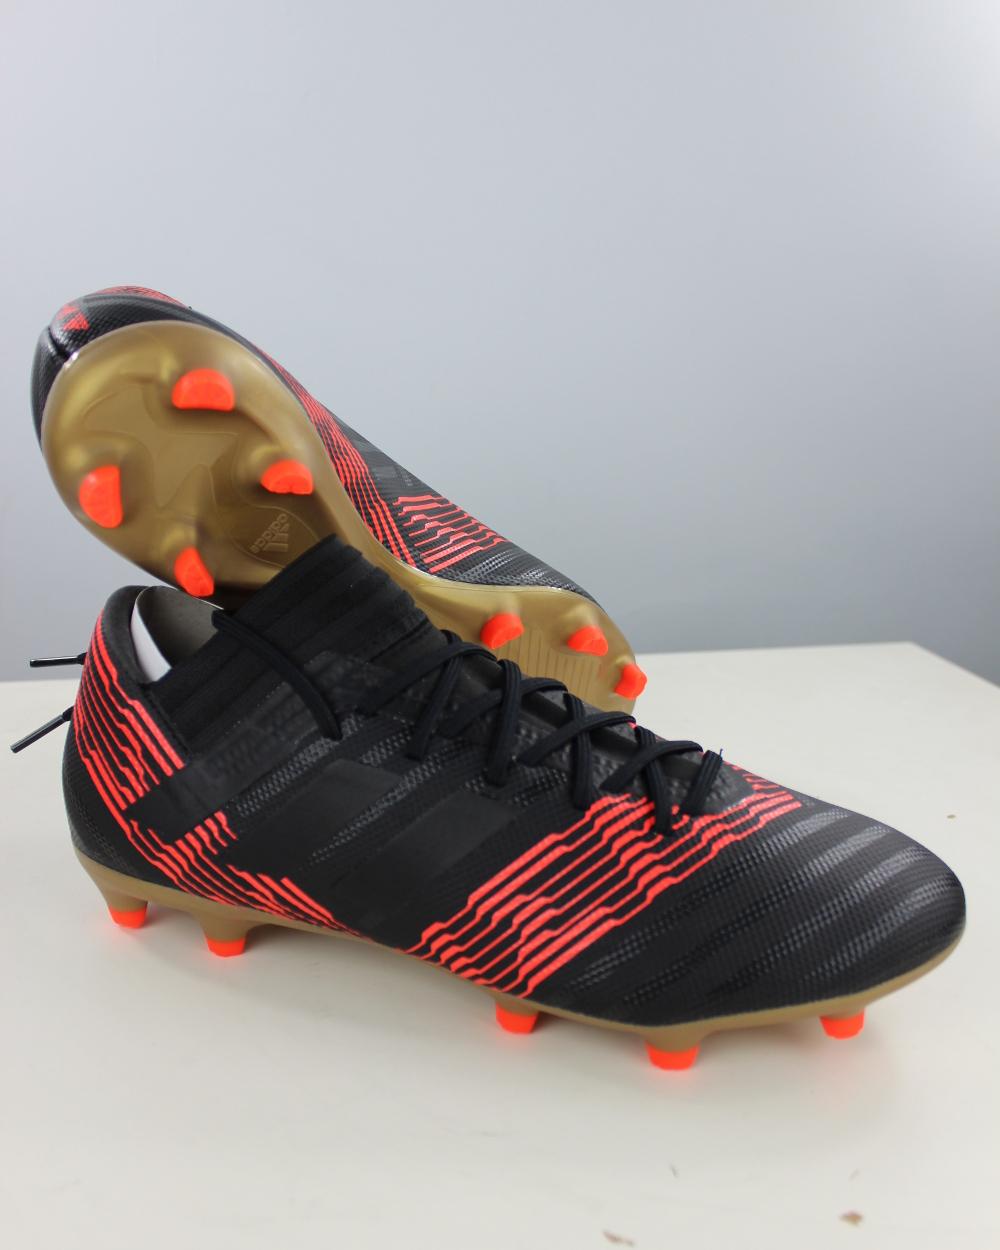 finest selection 336f7 86be5 Football shoes Adidas Scarpe da Calcio Nemeziz 17.3 FG Nero sky stalker Uomo  9 9 di 9 Vedi Altro